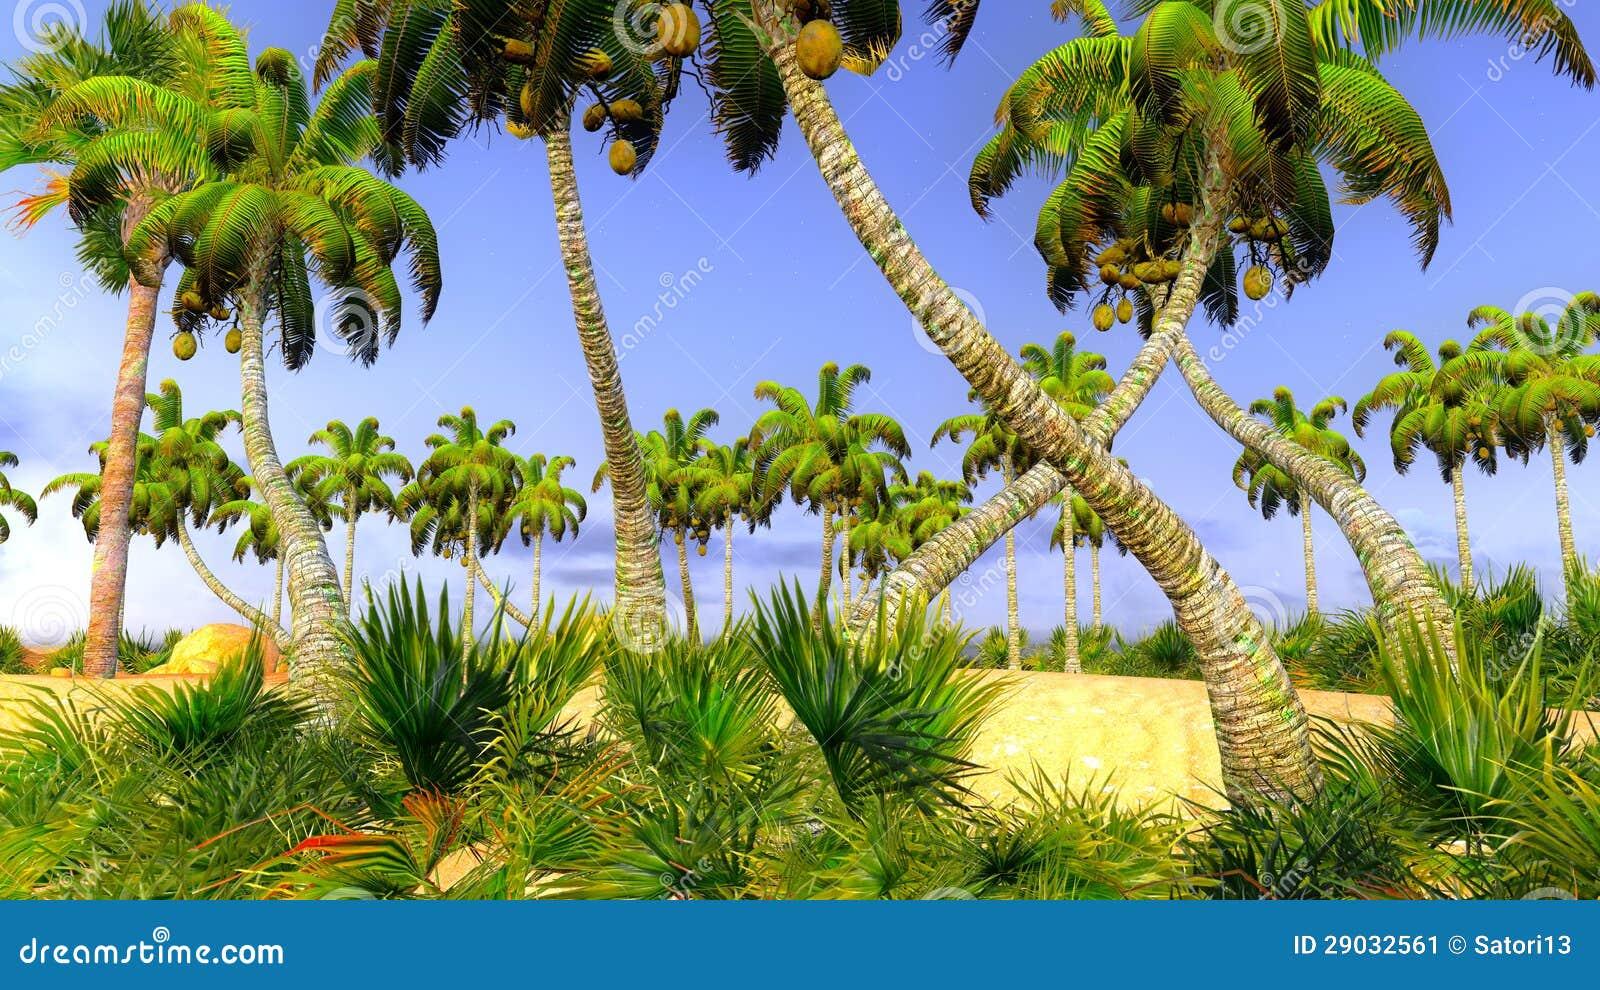 stock image of hawaiian - photo #23